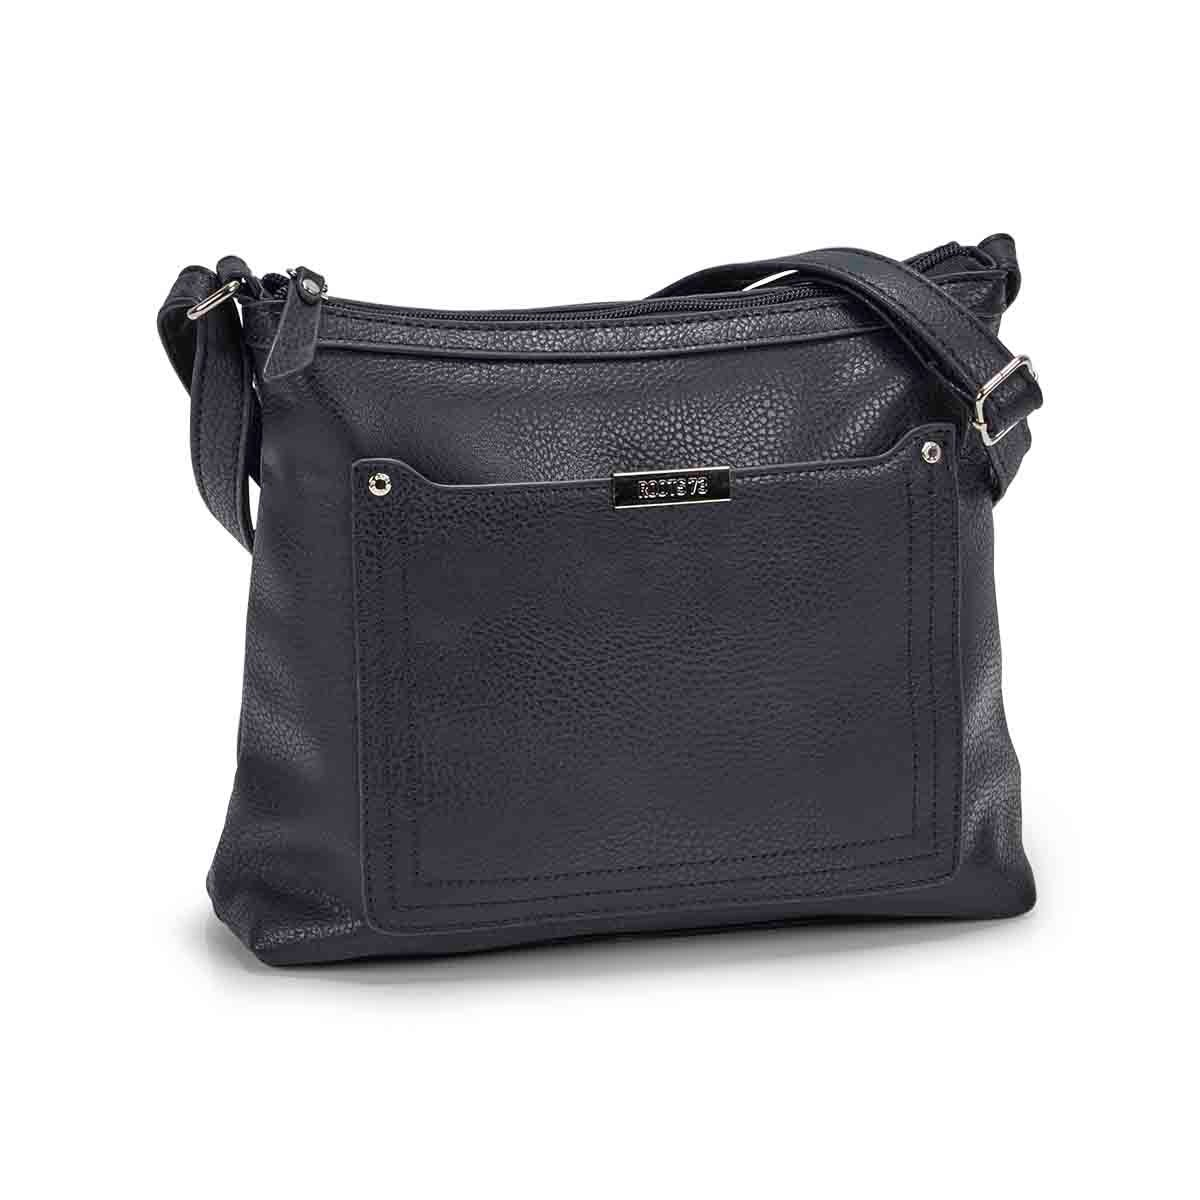 Women's 5438 navy stiched pocket crossbody bag